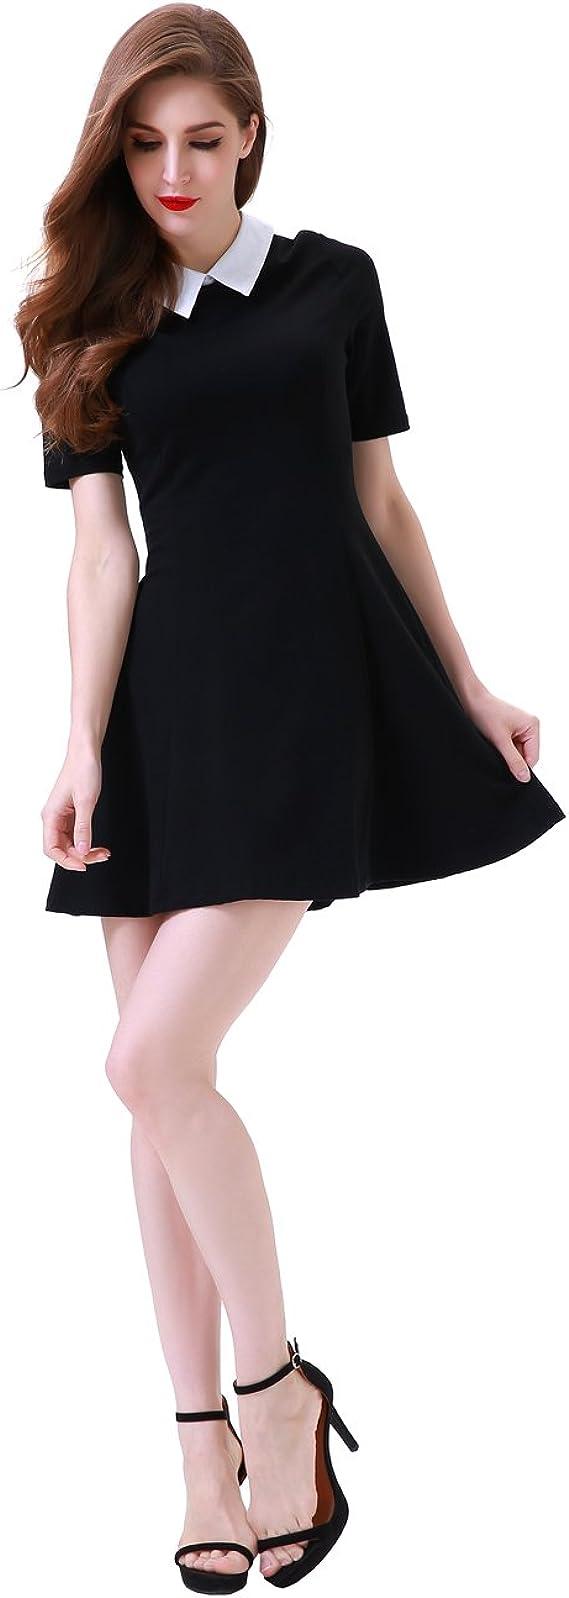 Andongnywell Womens Long Sleeve Peter Pan Collar Dress Doll Neck Flare Skater Dress Above Knee Tunic Dress